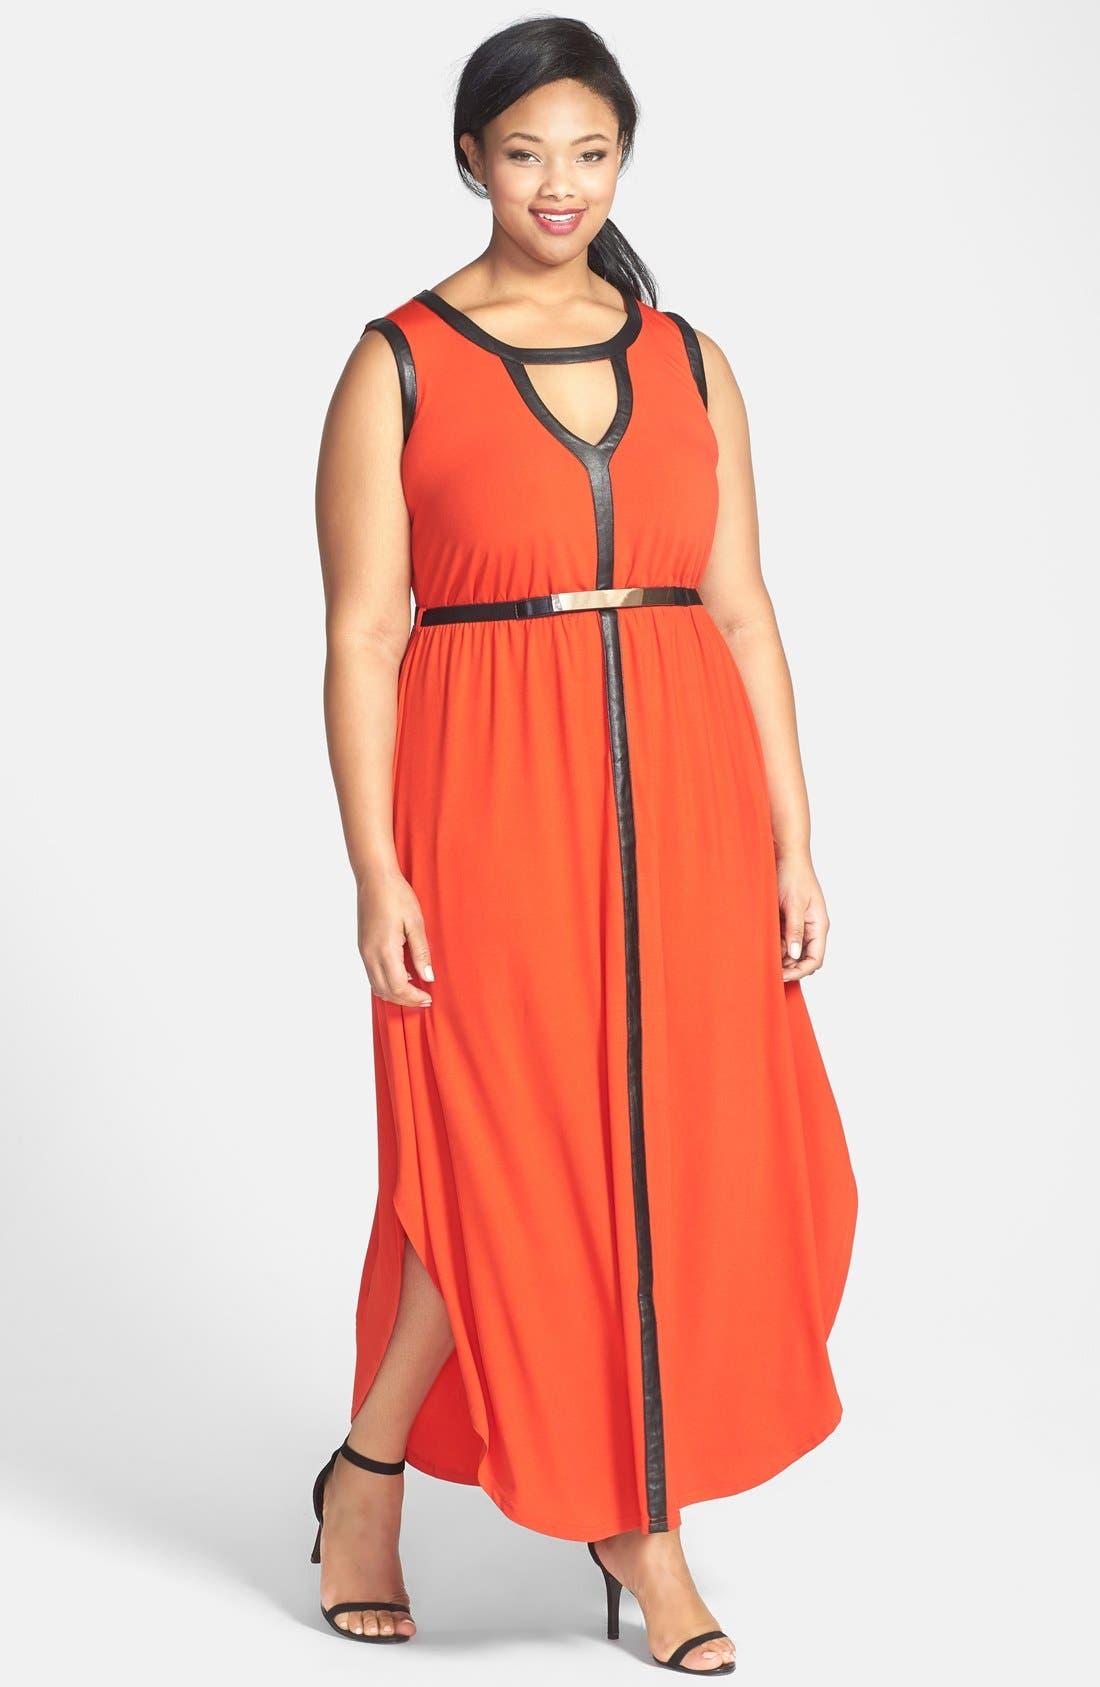 Main Image - City Chic 'Grecian' Faux Leather Trim Keyhole Maxi Dress (Plus Size)